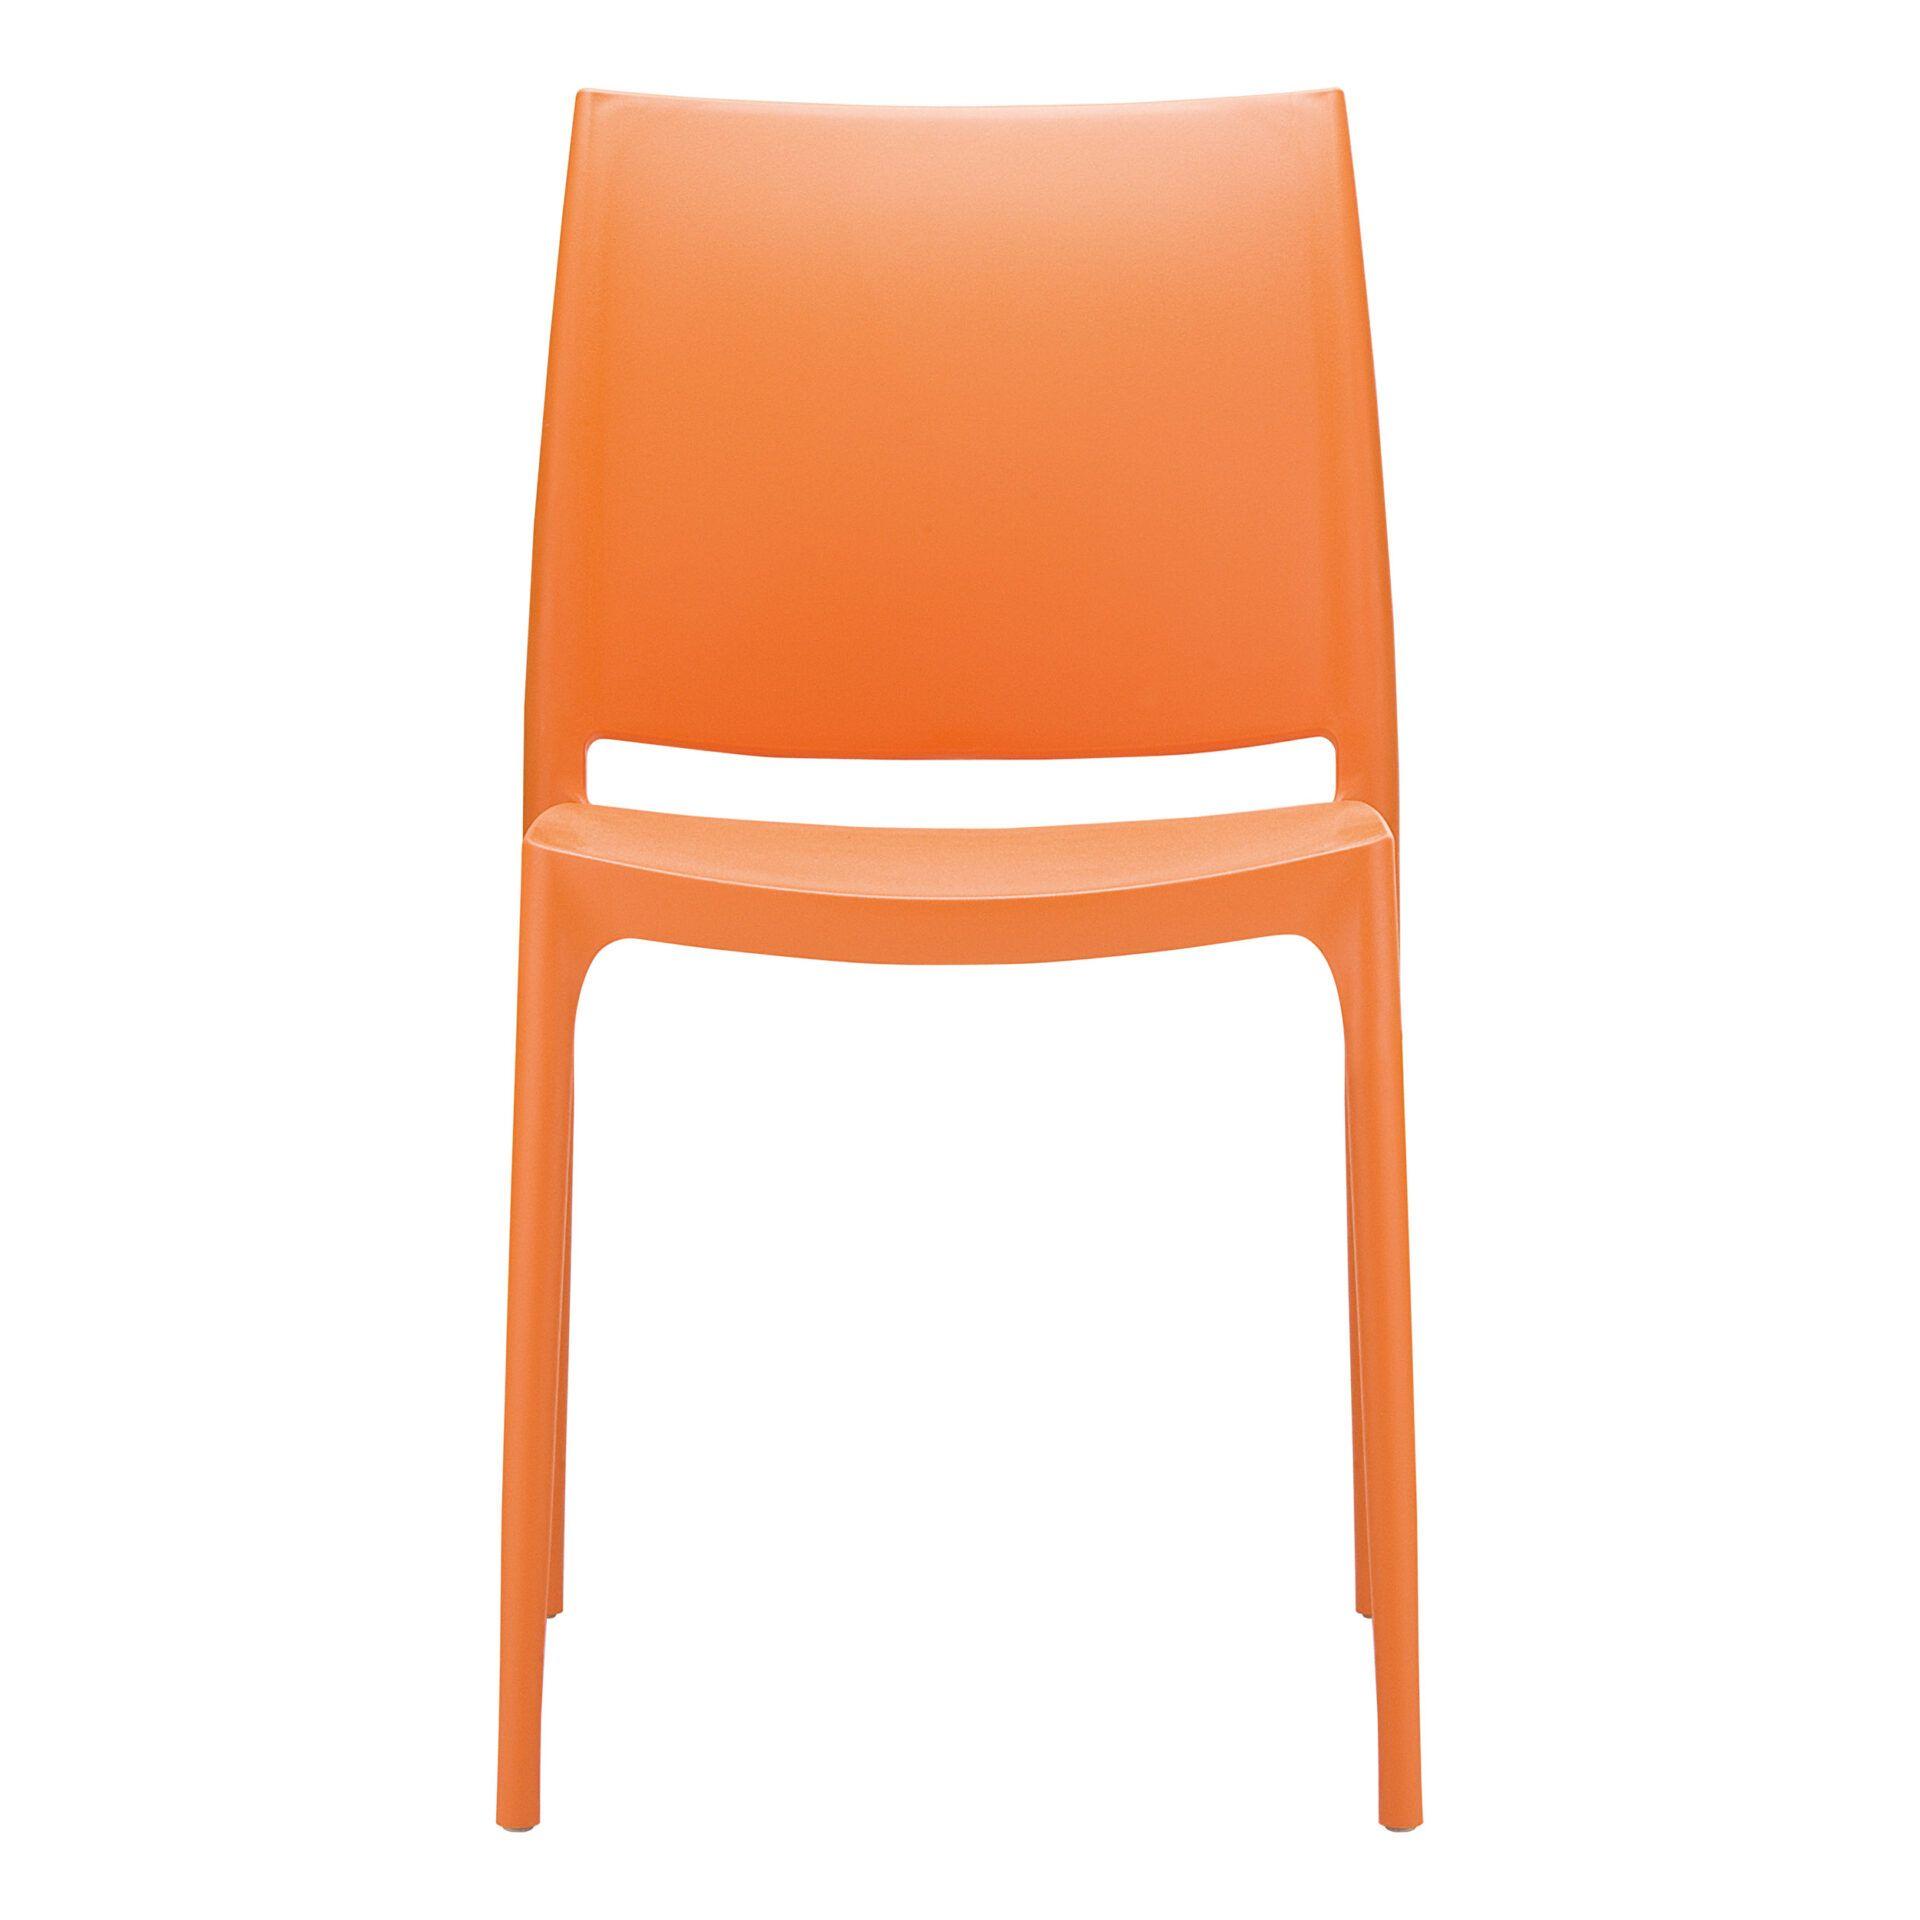 outdoor dining maya chair orange front